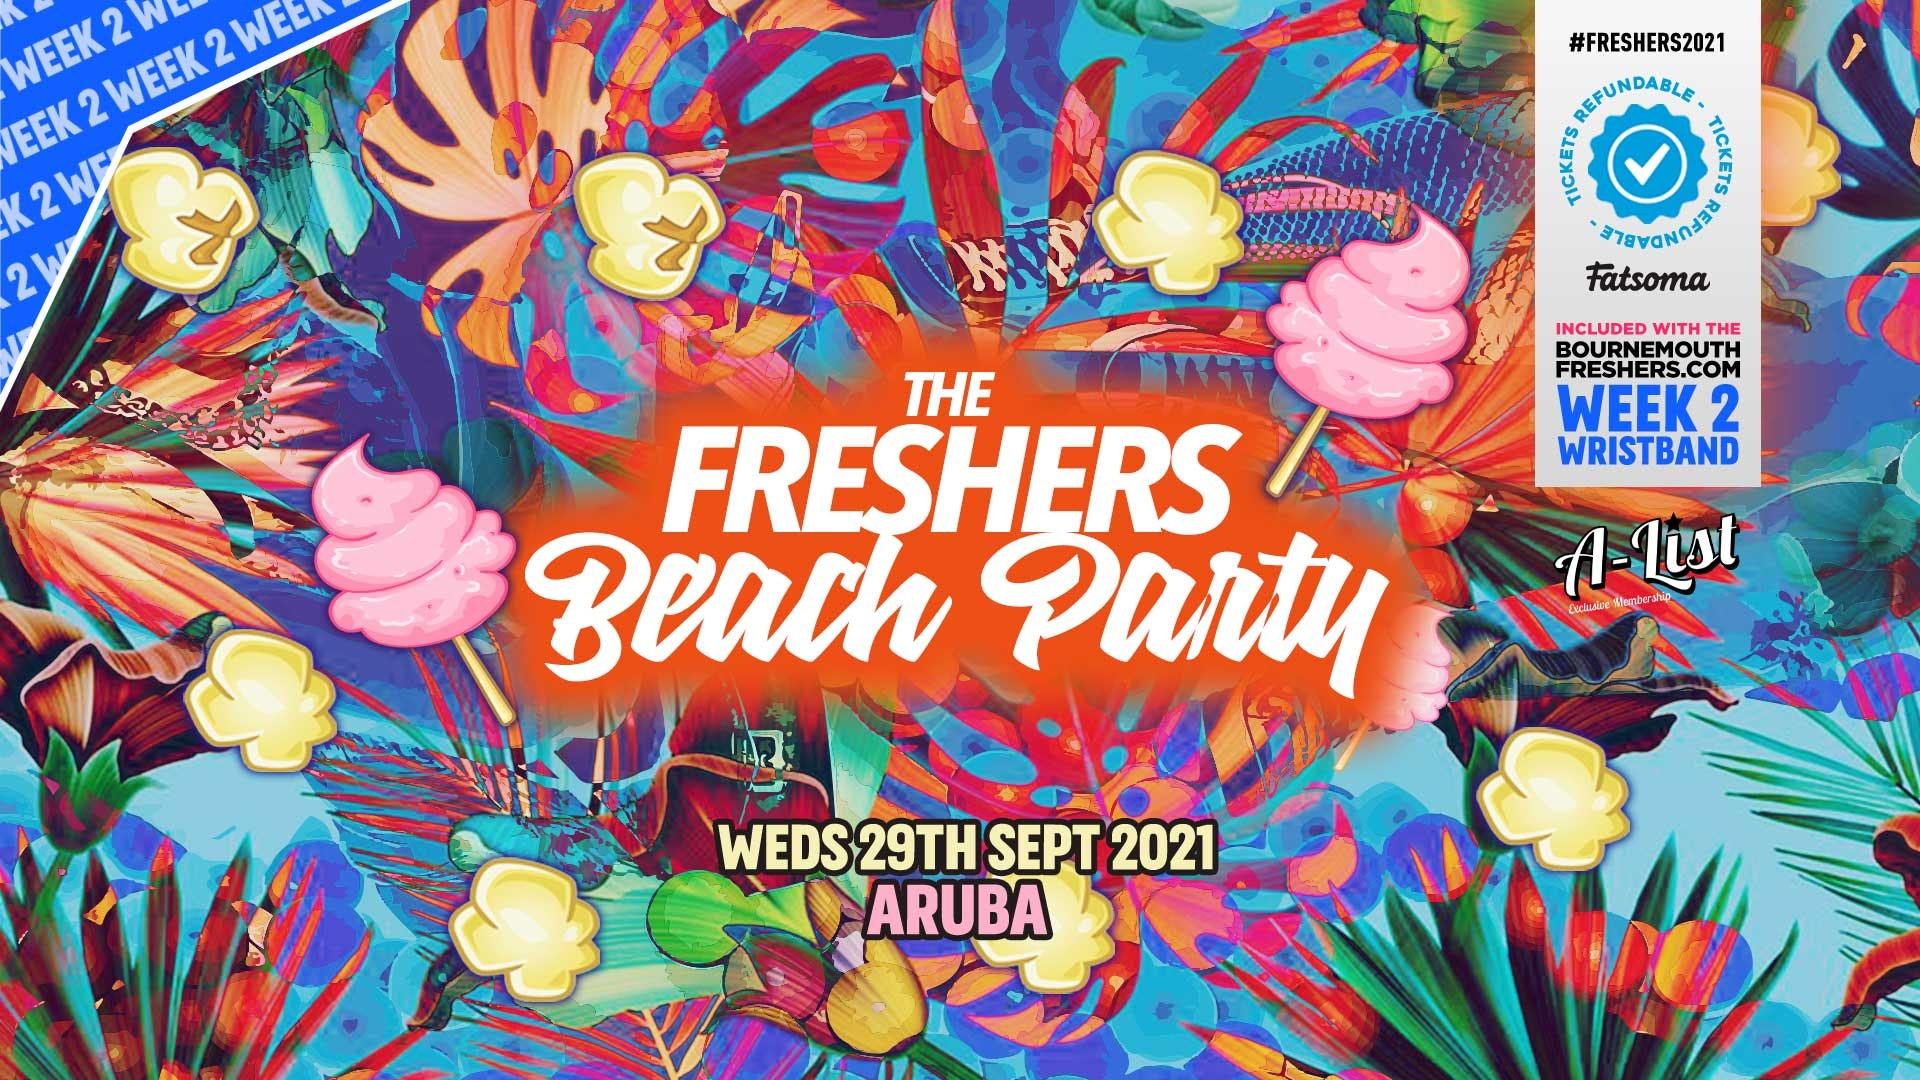 Freshers Beach Party @ Aruba | Bournemouth Freshers 2021